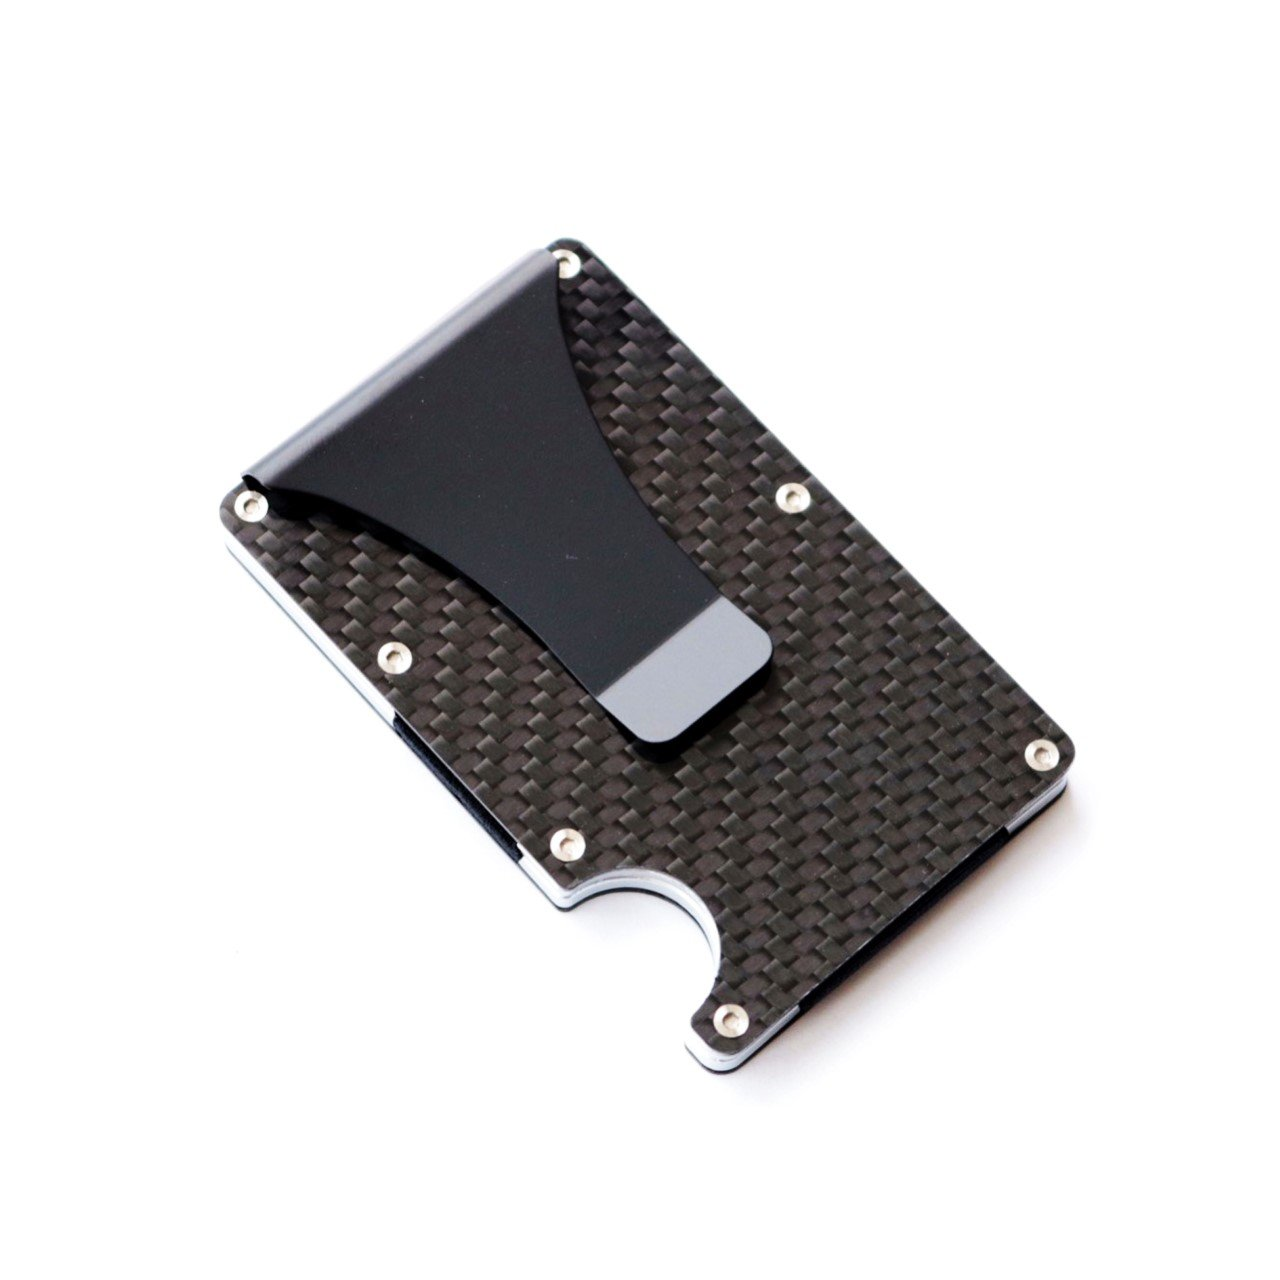 Kings Man : Minimalist Carbon Fibre Slim RFID Wallet with Money Clip by Kingsman Royale